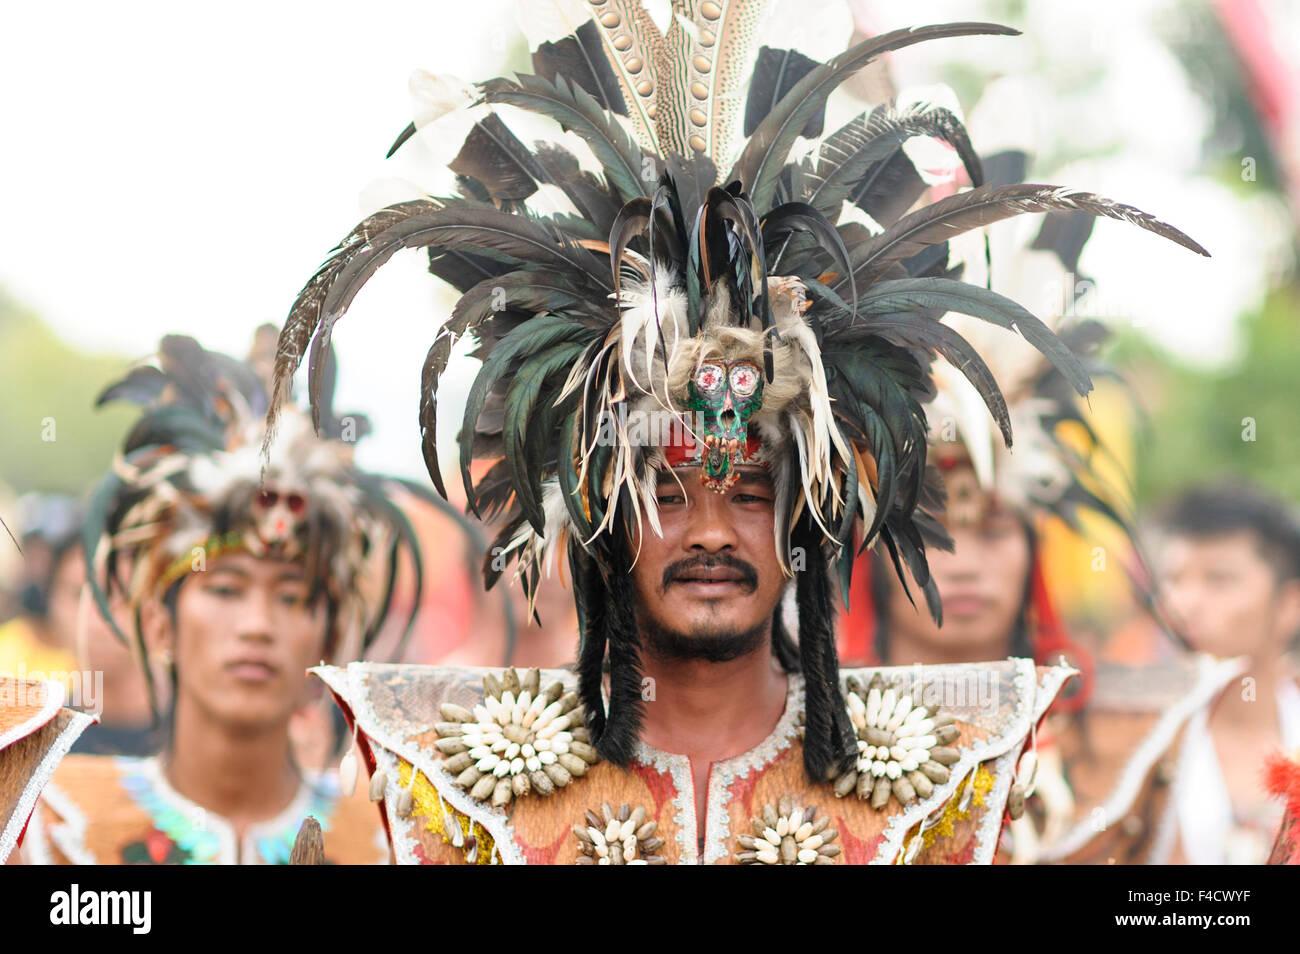 The Dayak of Kalimantan.An Extra ordinary performance and ritual during Chap Go Meh @ Cap Gomeh celebration in Singkawang, - Stock Image